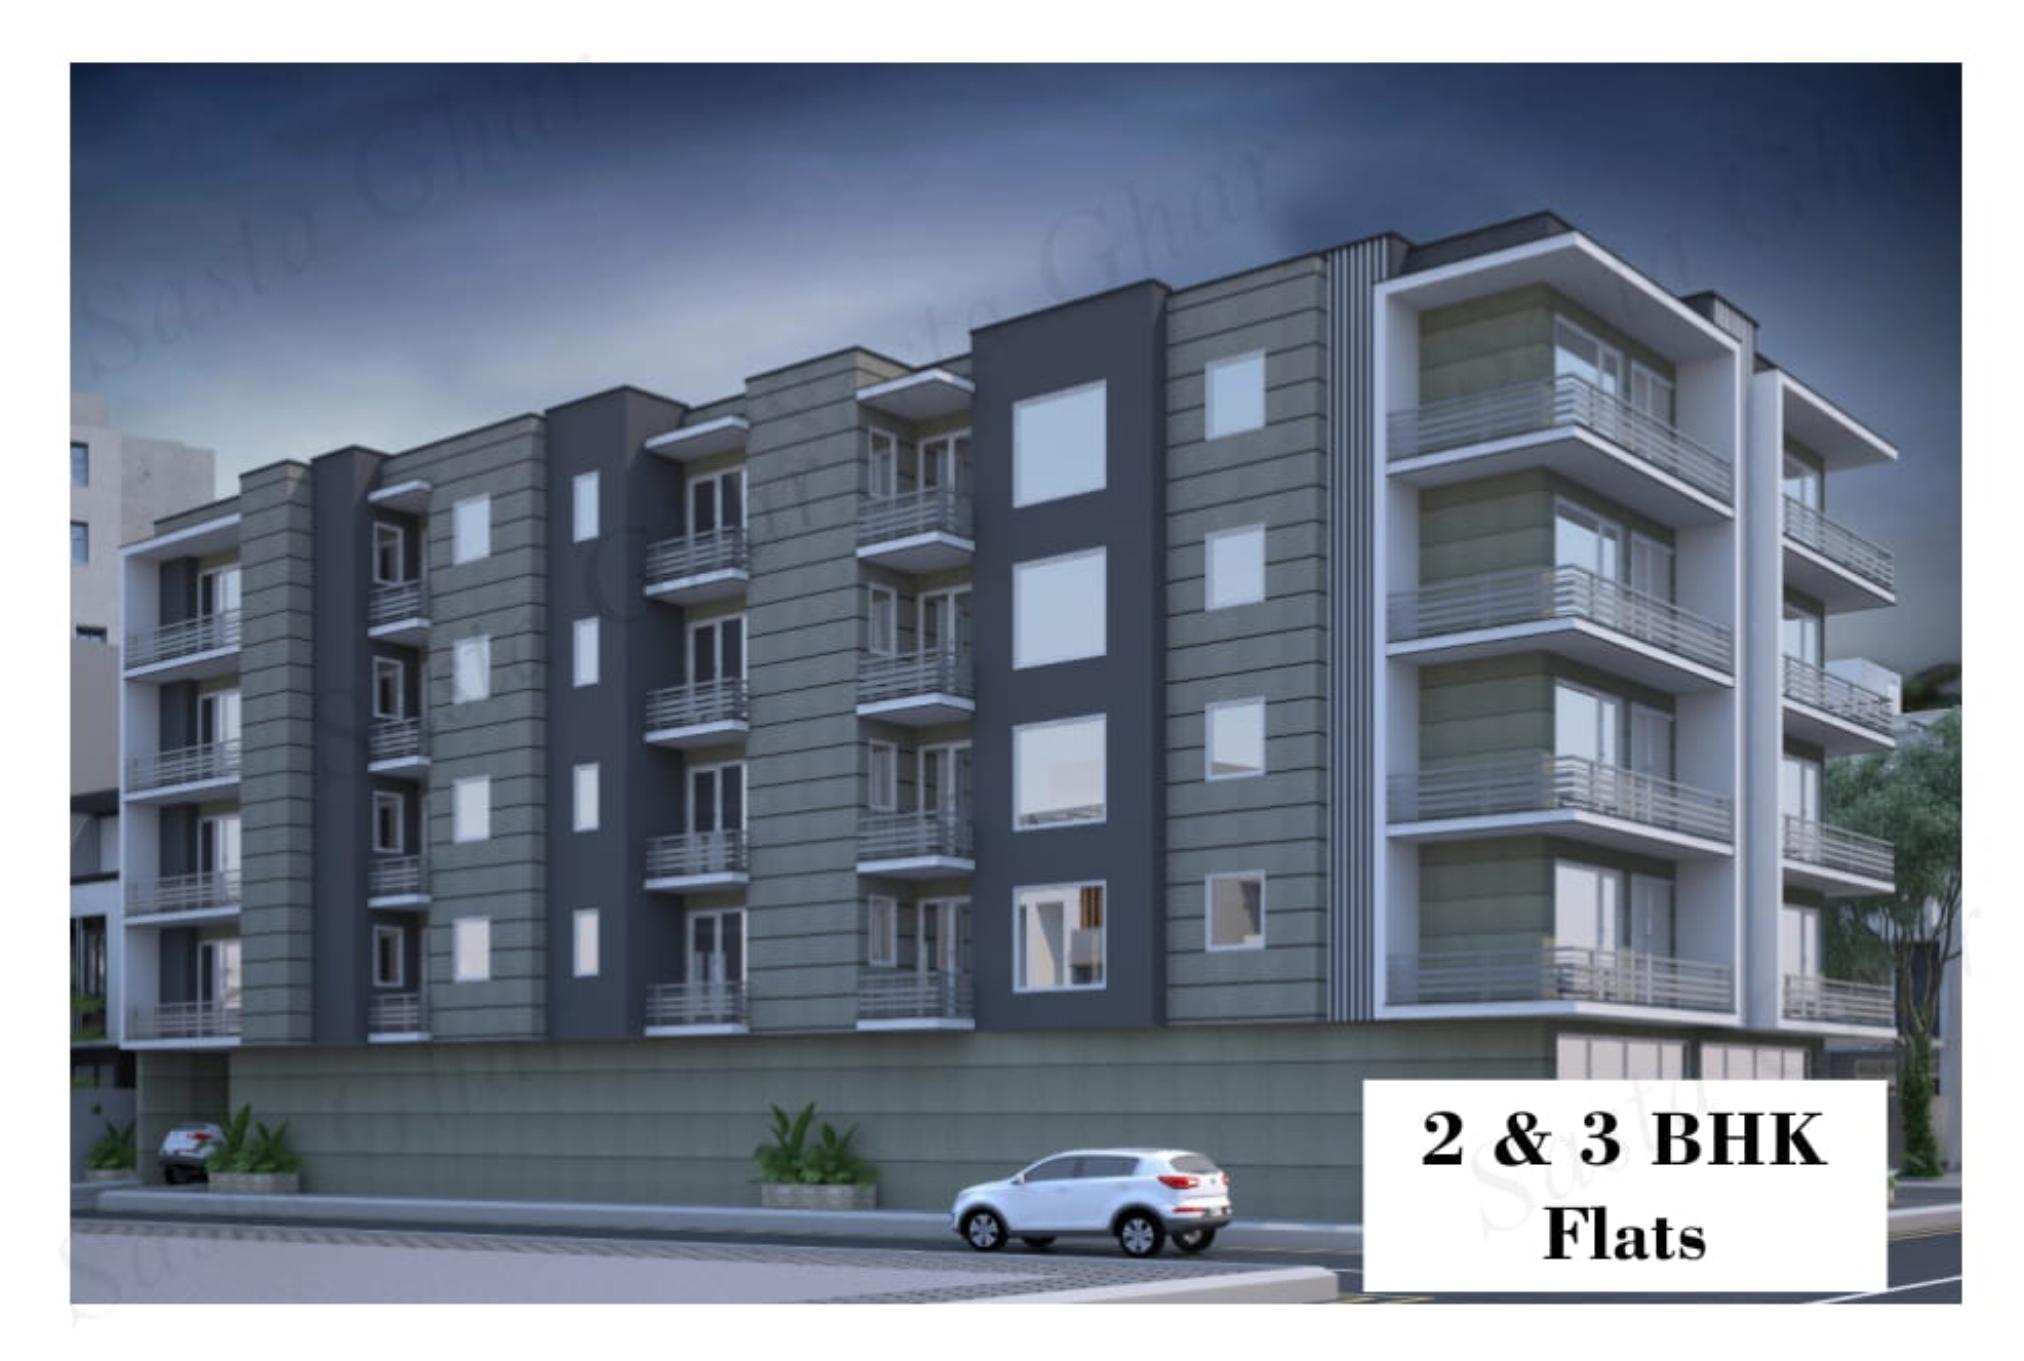 2 BHK Flats in Chattarpur Image